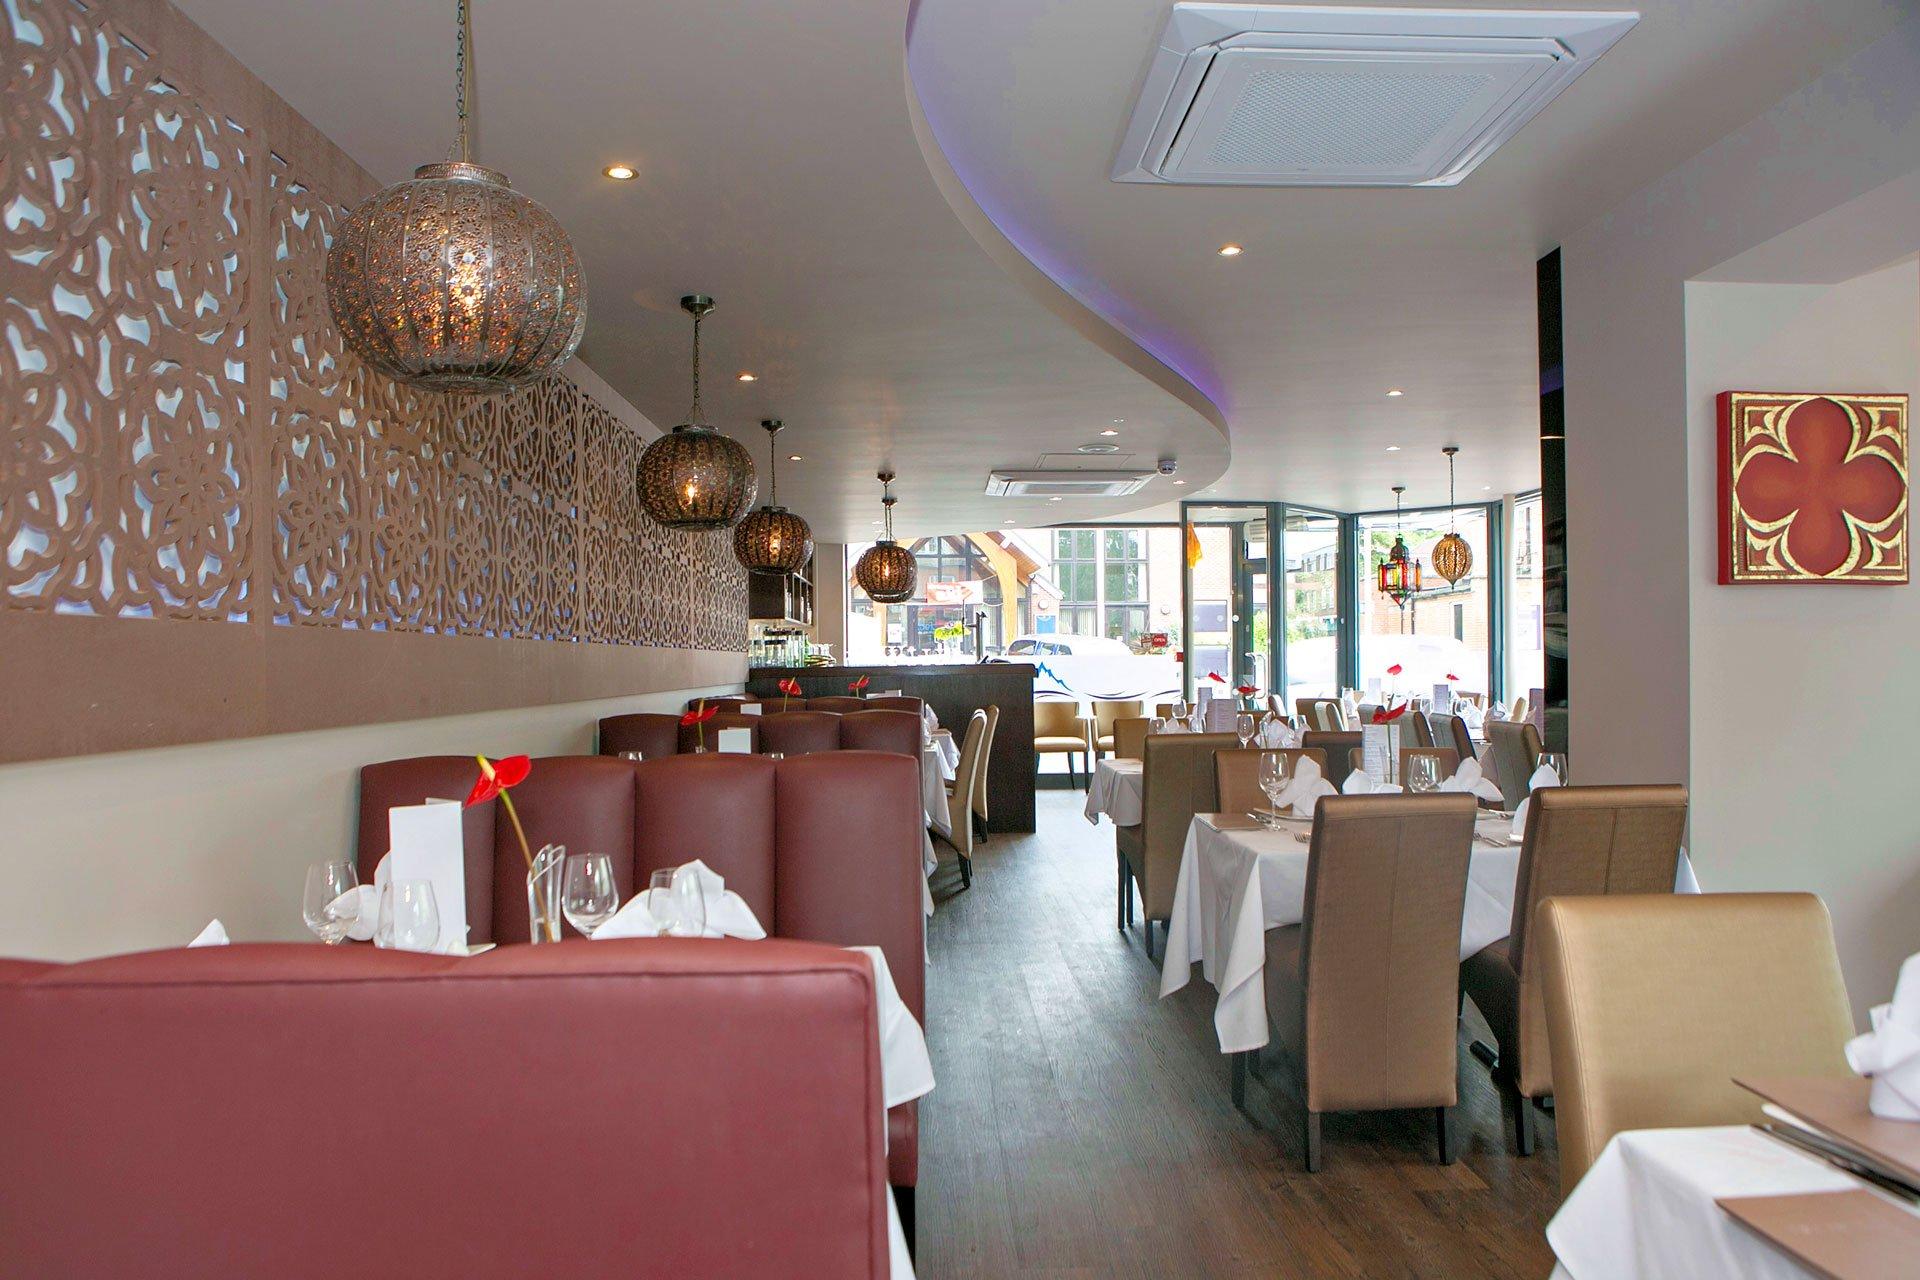 Lunch - The 29029 Restaurant Broadstone